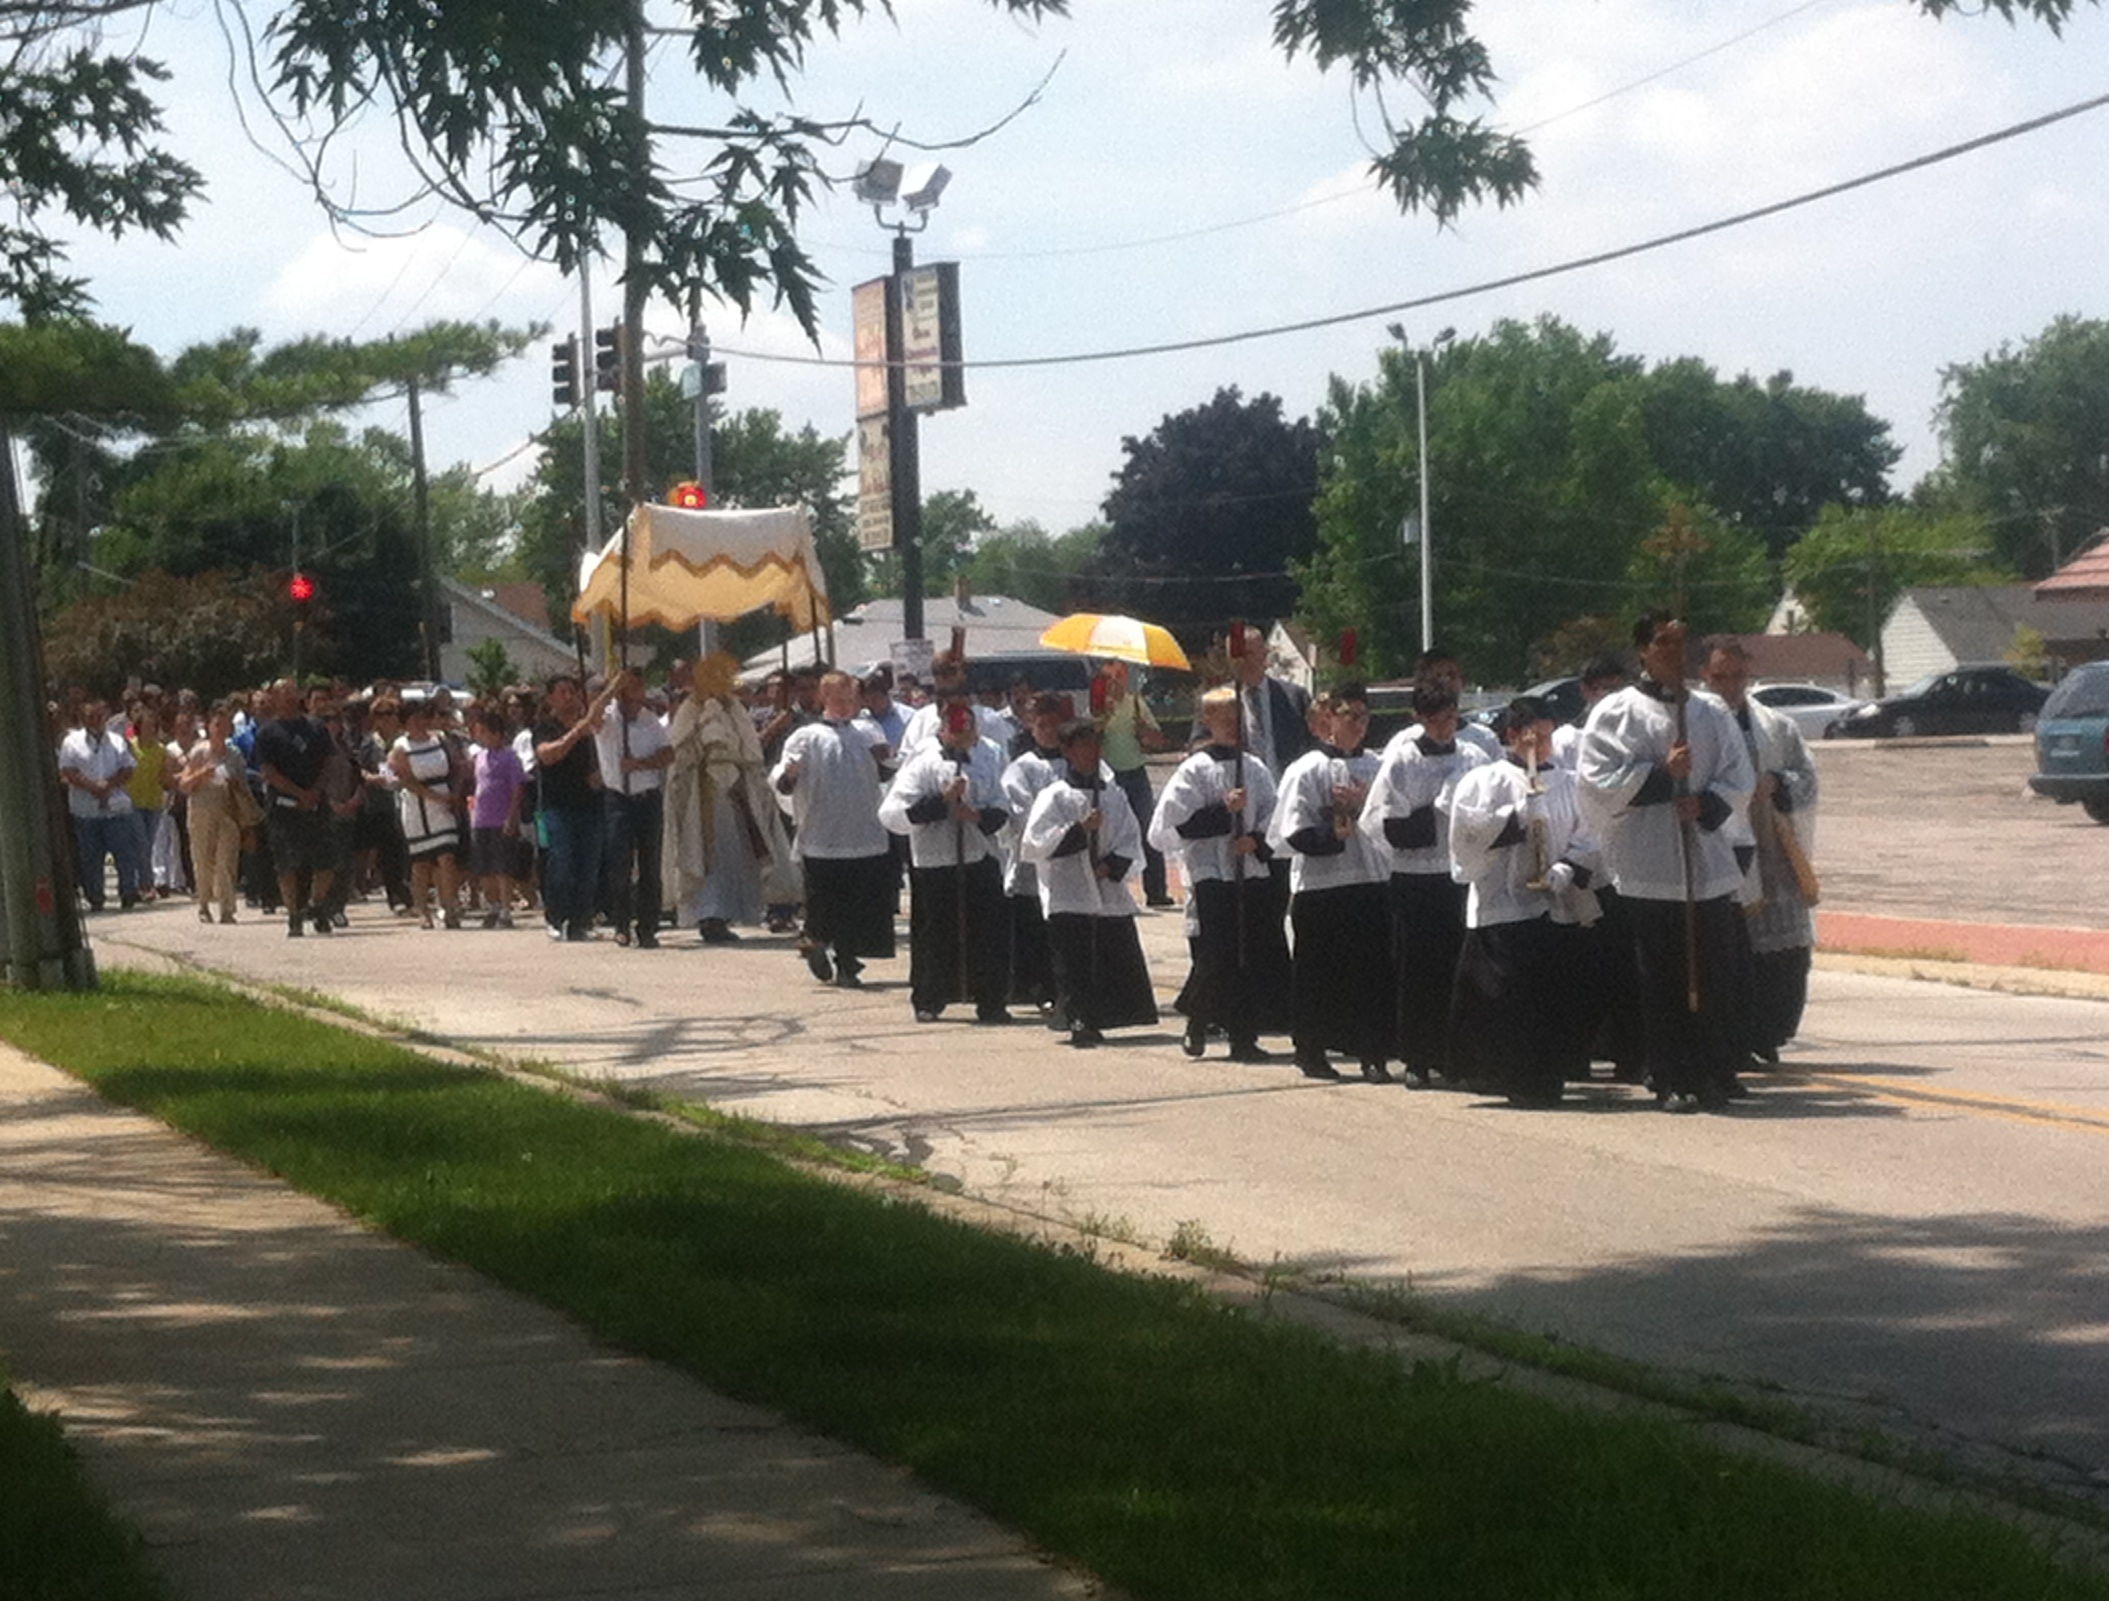 1 The Procession